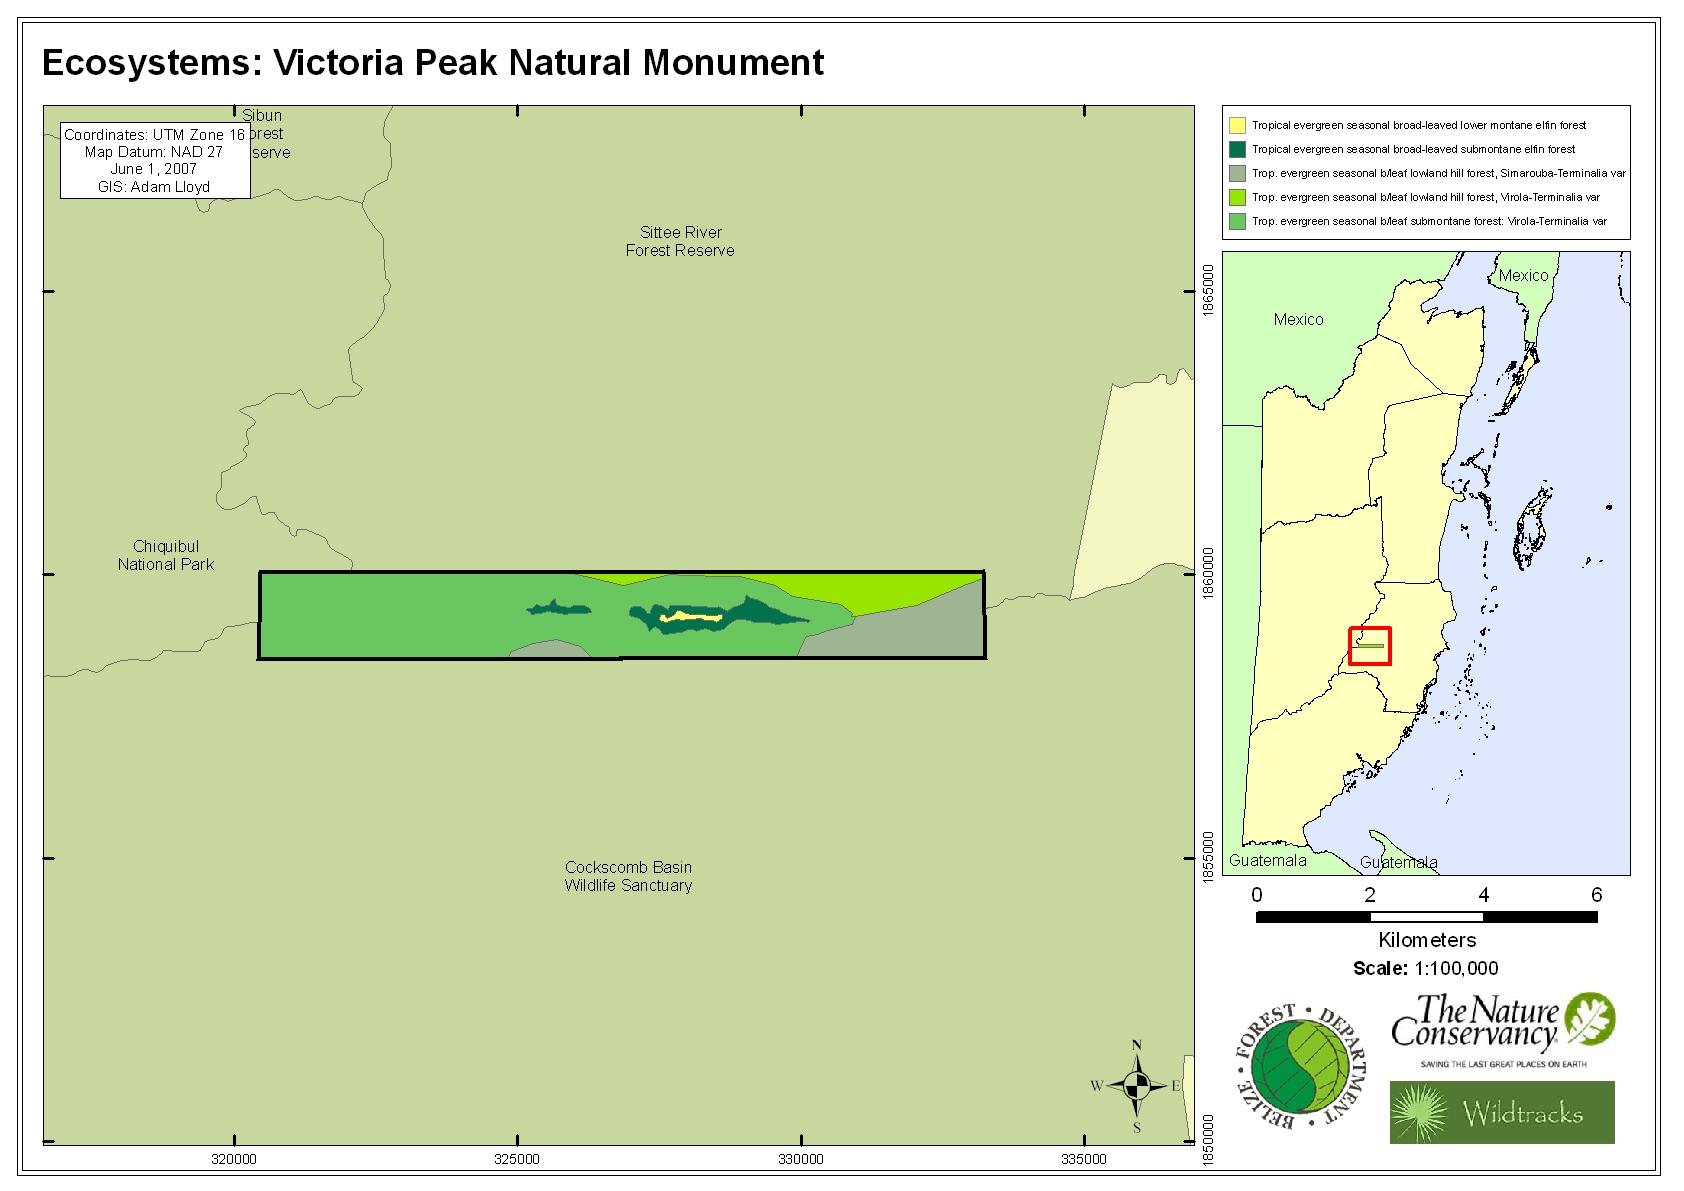 Ecosystems: Victoria Peak Natural Monument